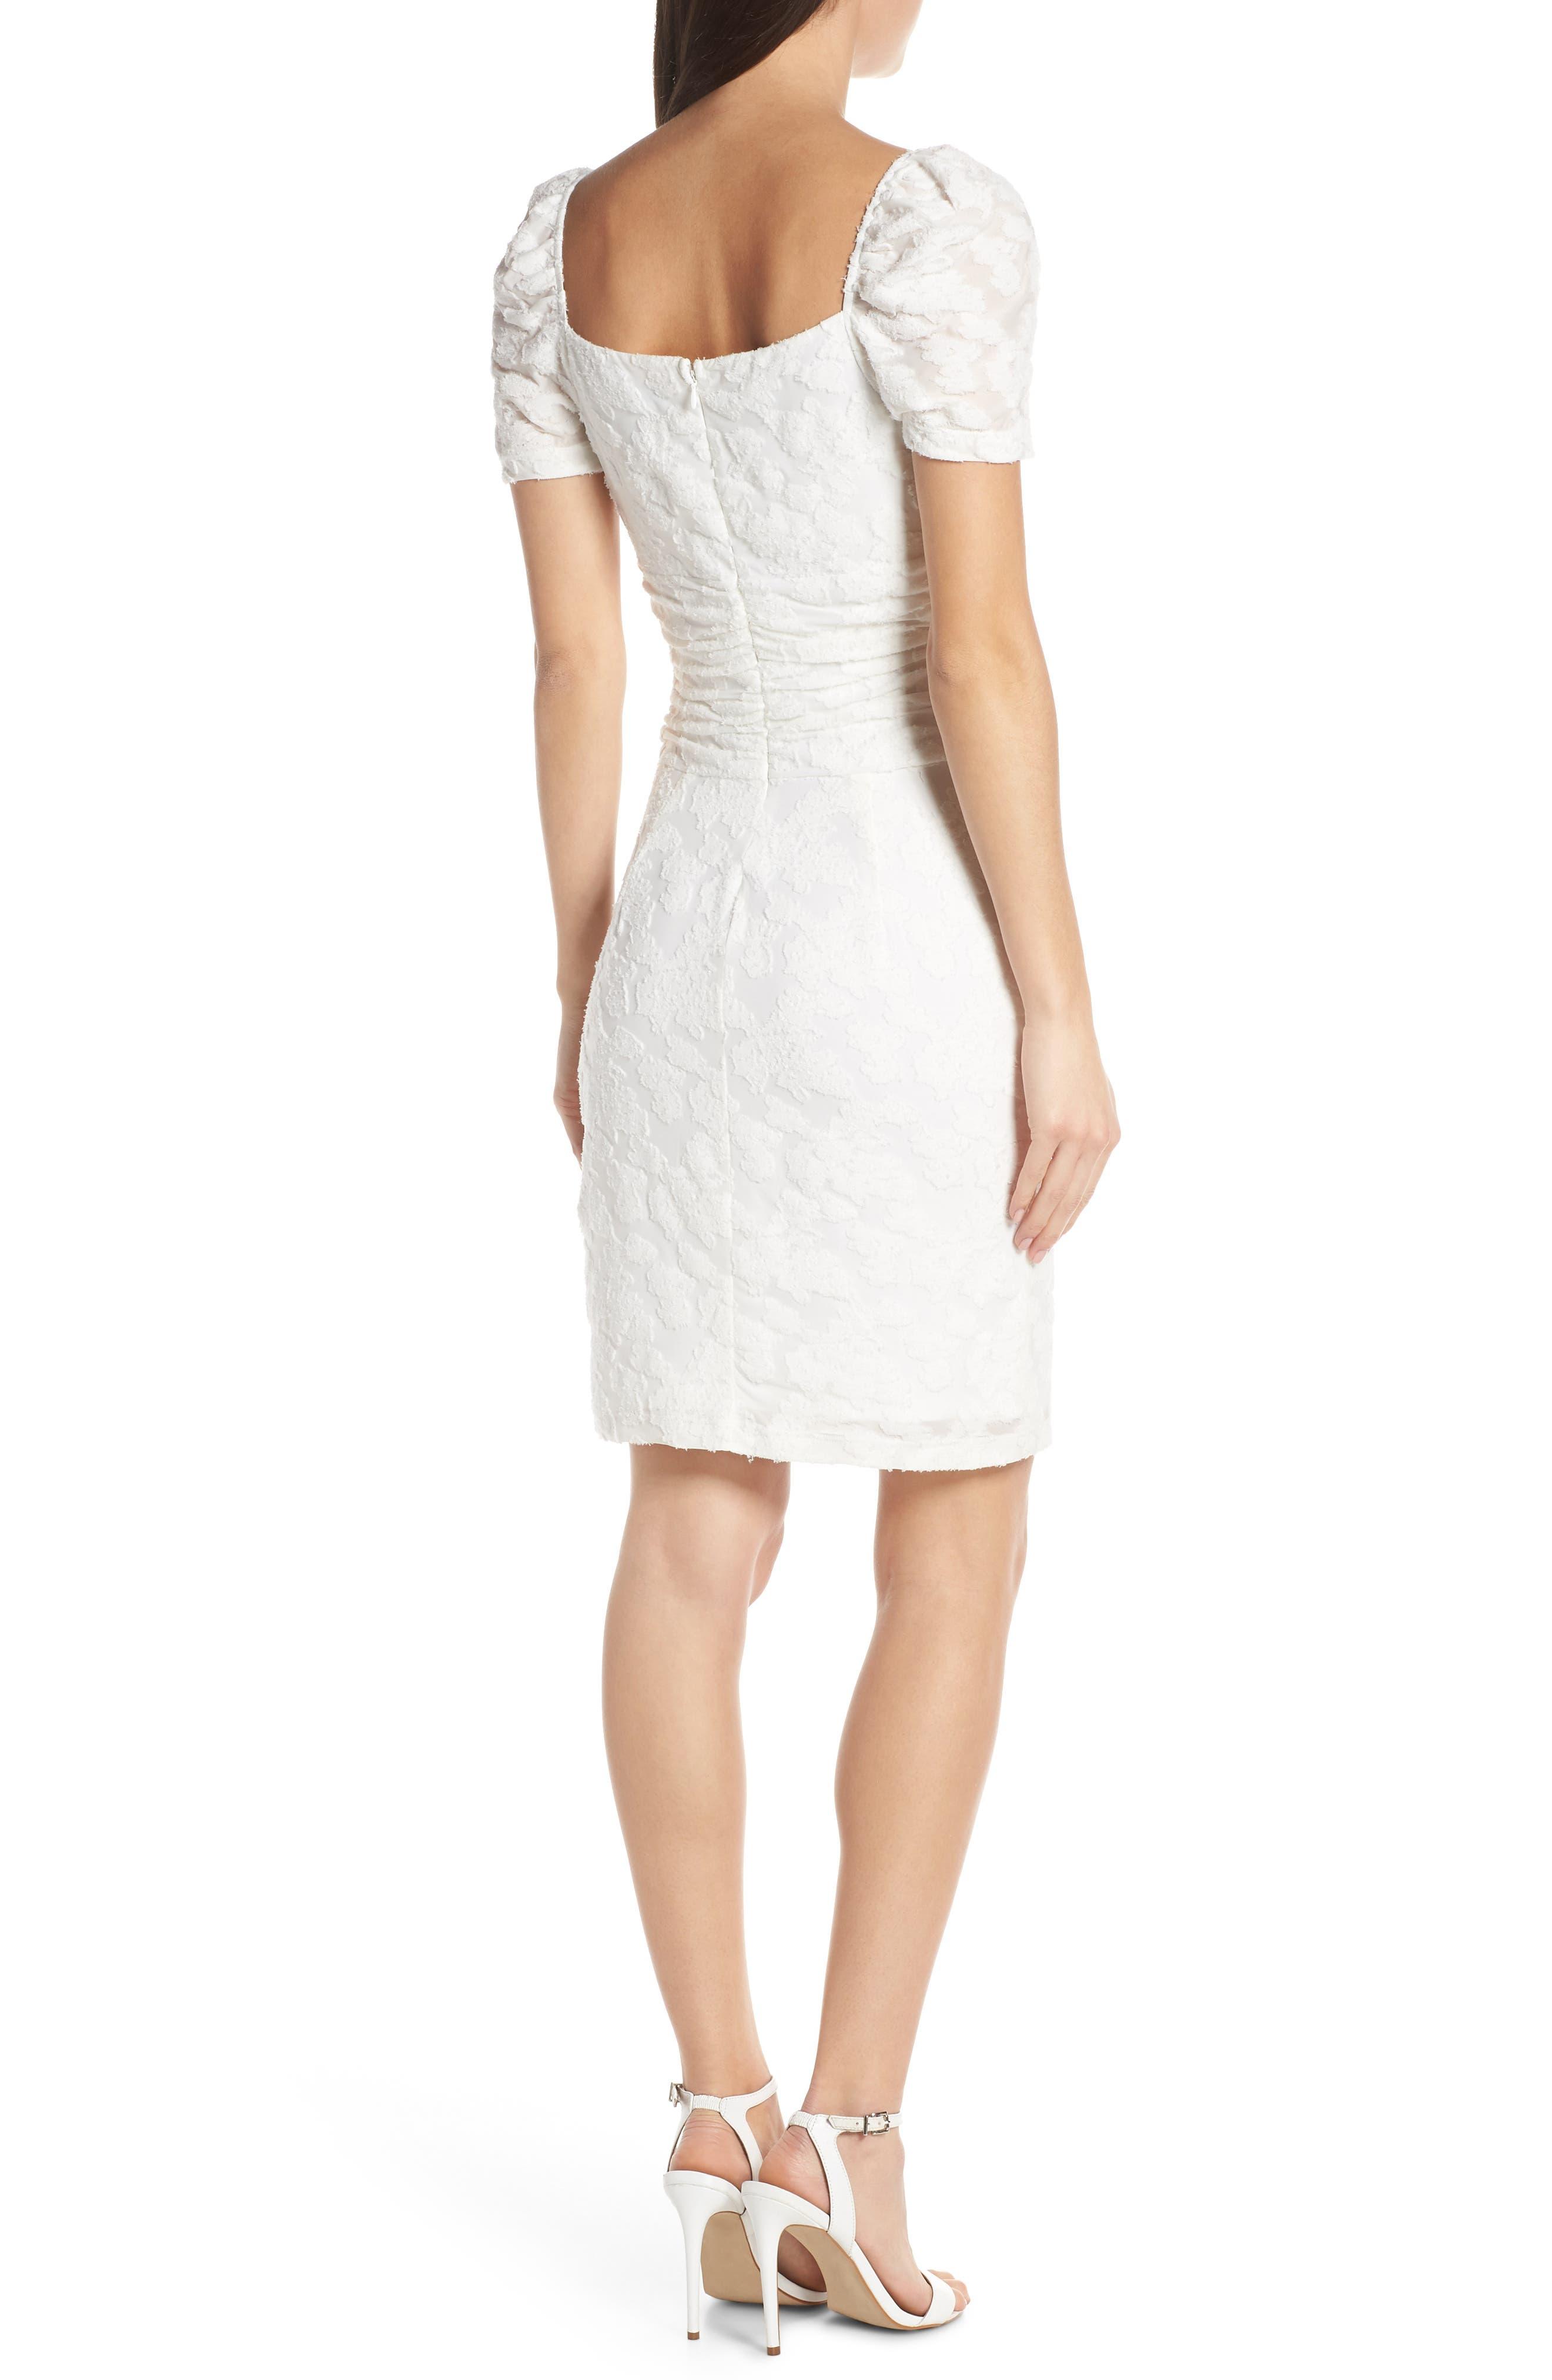 ALI & JAY, Big Mistake Short Sleeve Sheath Dress, Alternate thumbnail 2, color, WHITE FLORAL